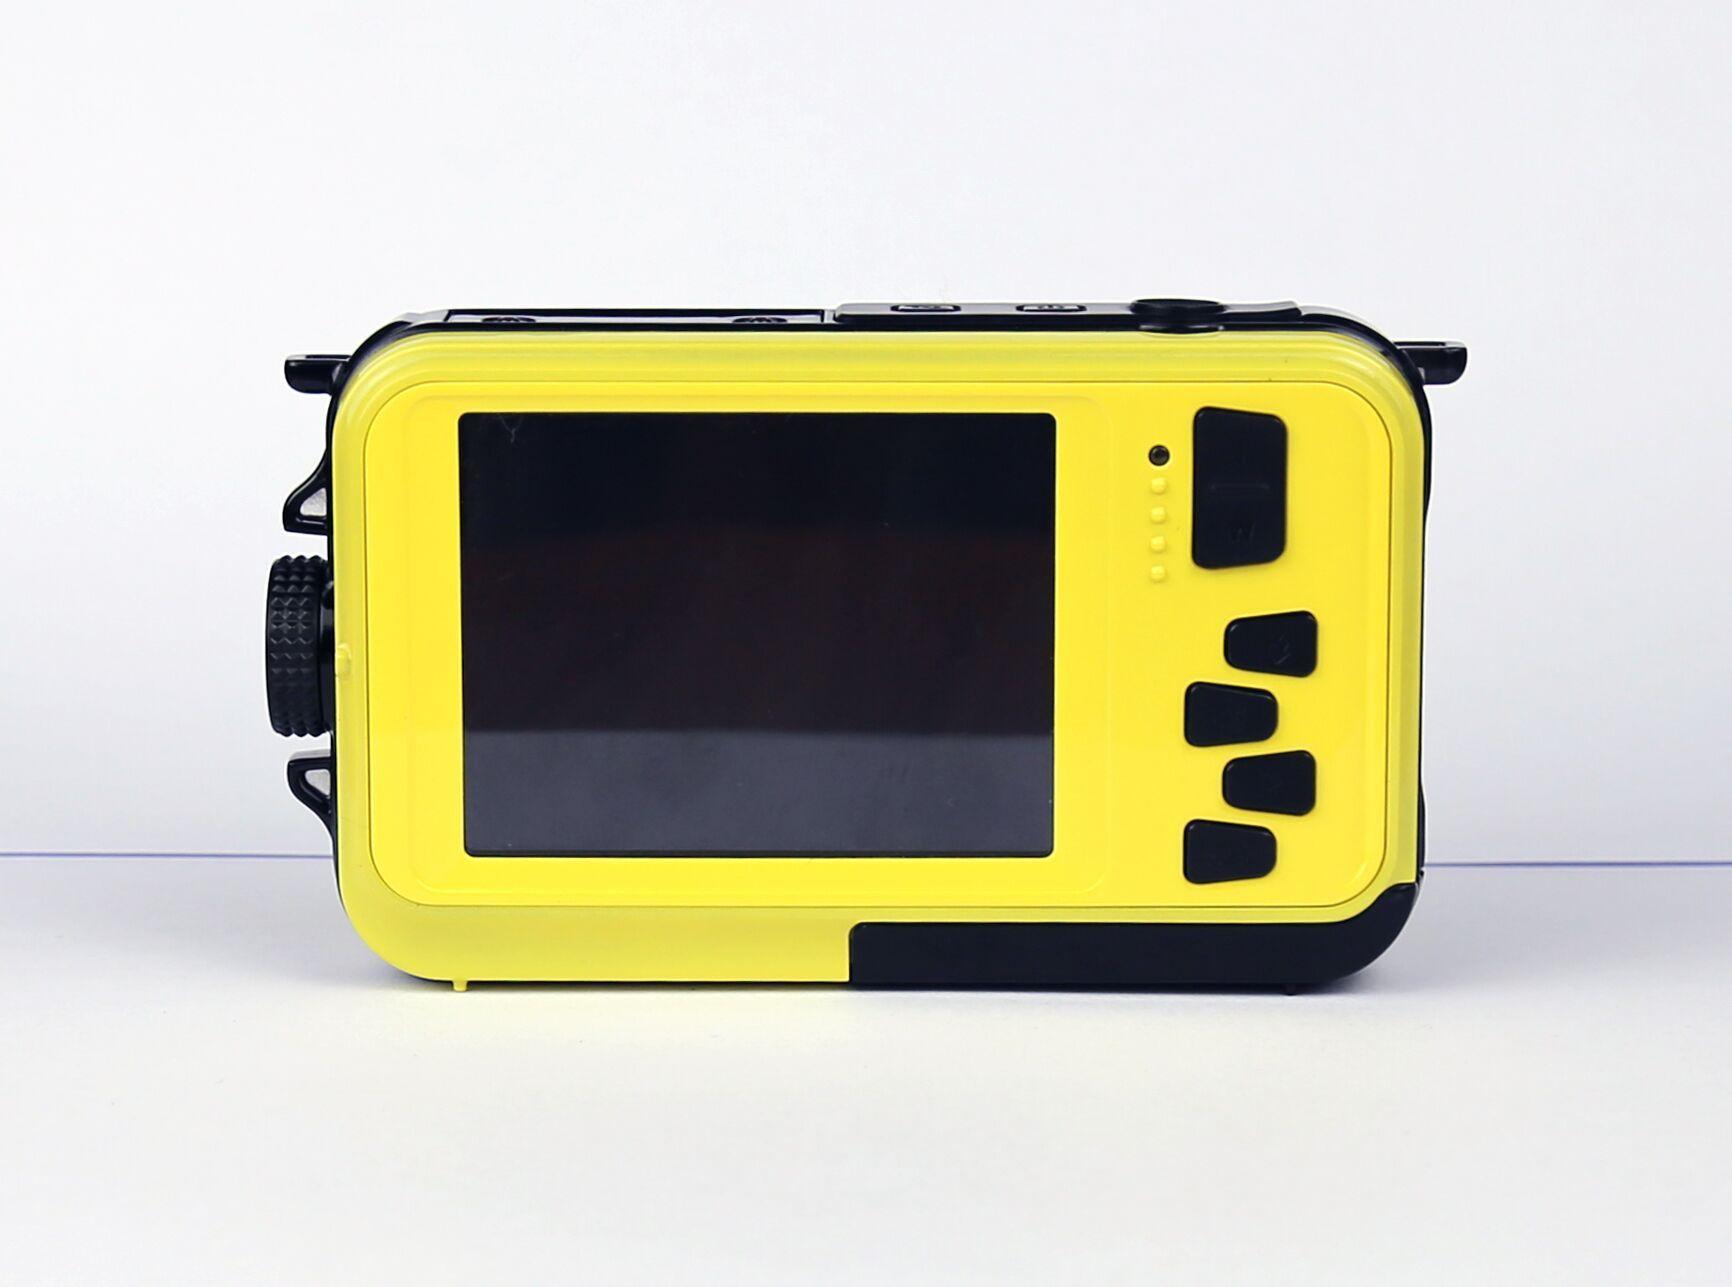 20pcs--Dual screen camera waterproof high-definition digital camera dv camera